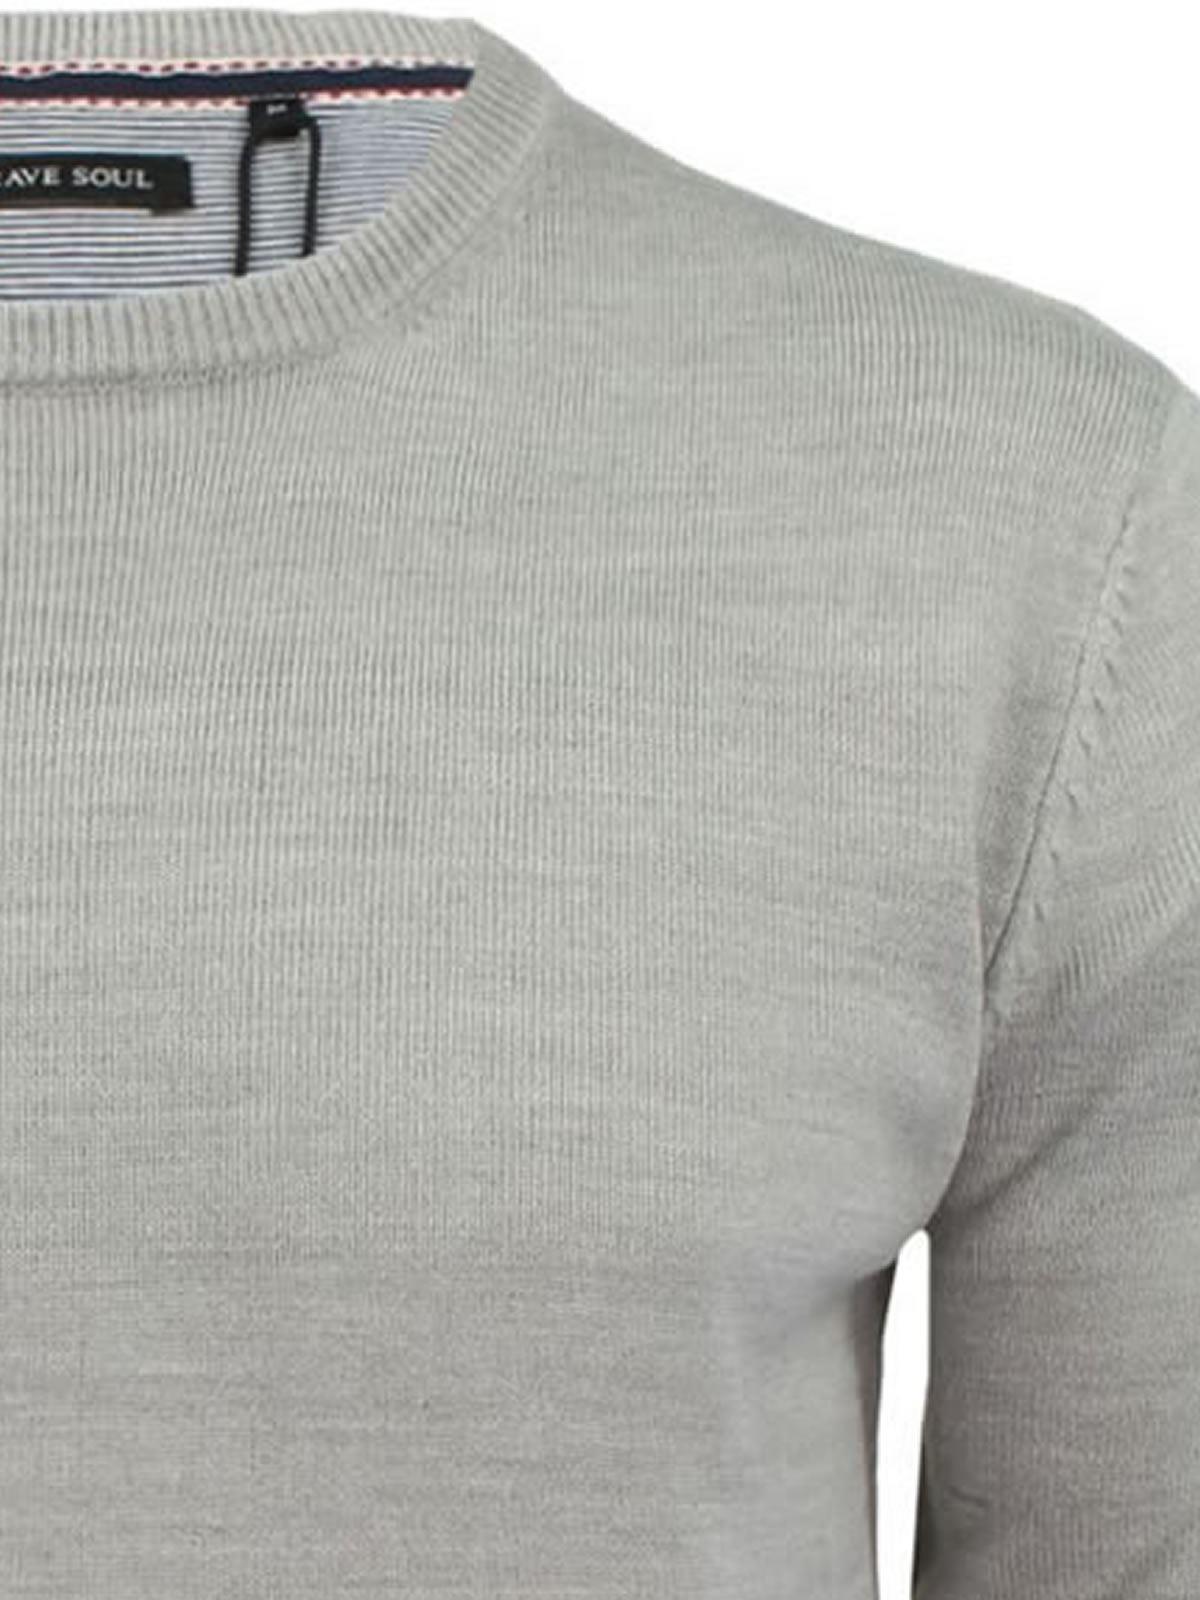 Brave-Soul-Urbain-Mens-Jumper-Knitted-Crew-Neck-Sweater thumbnail 12